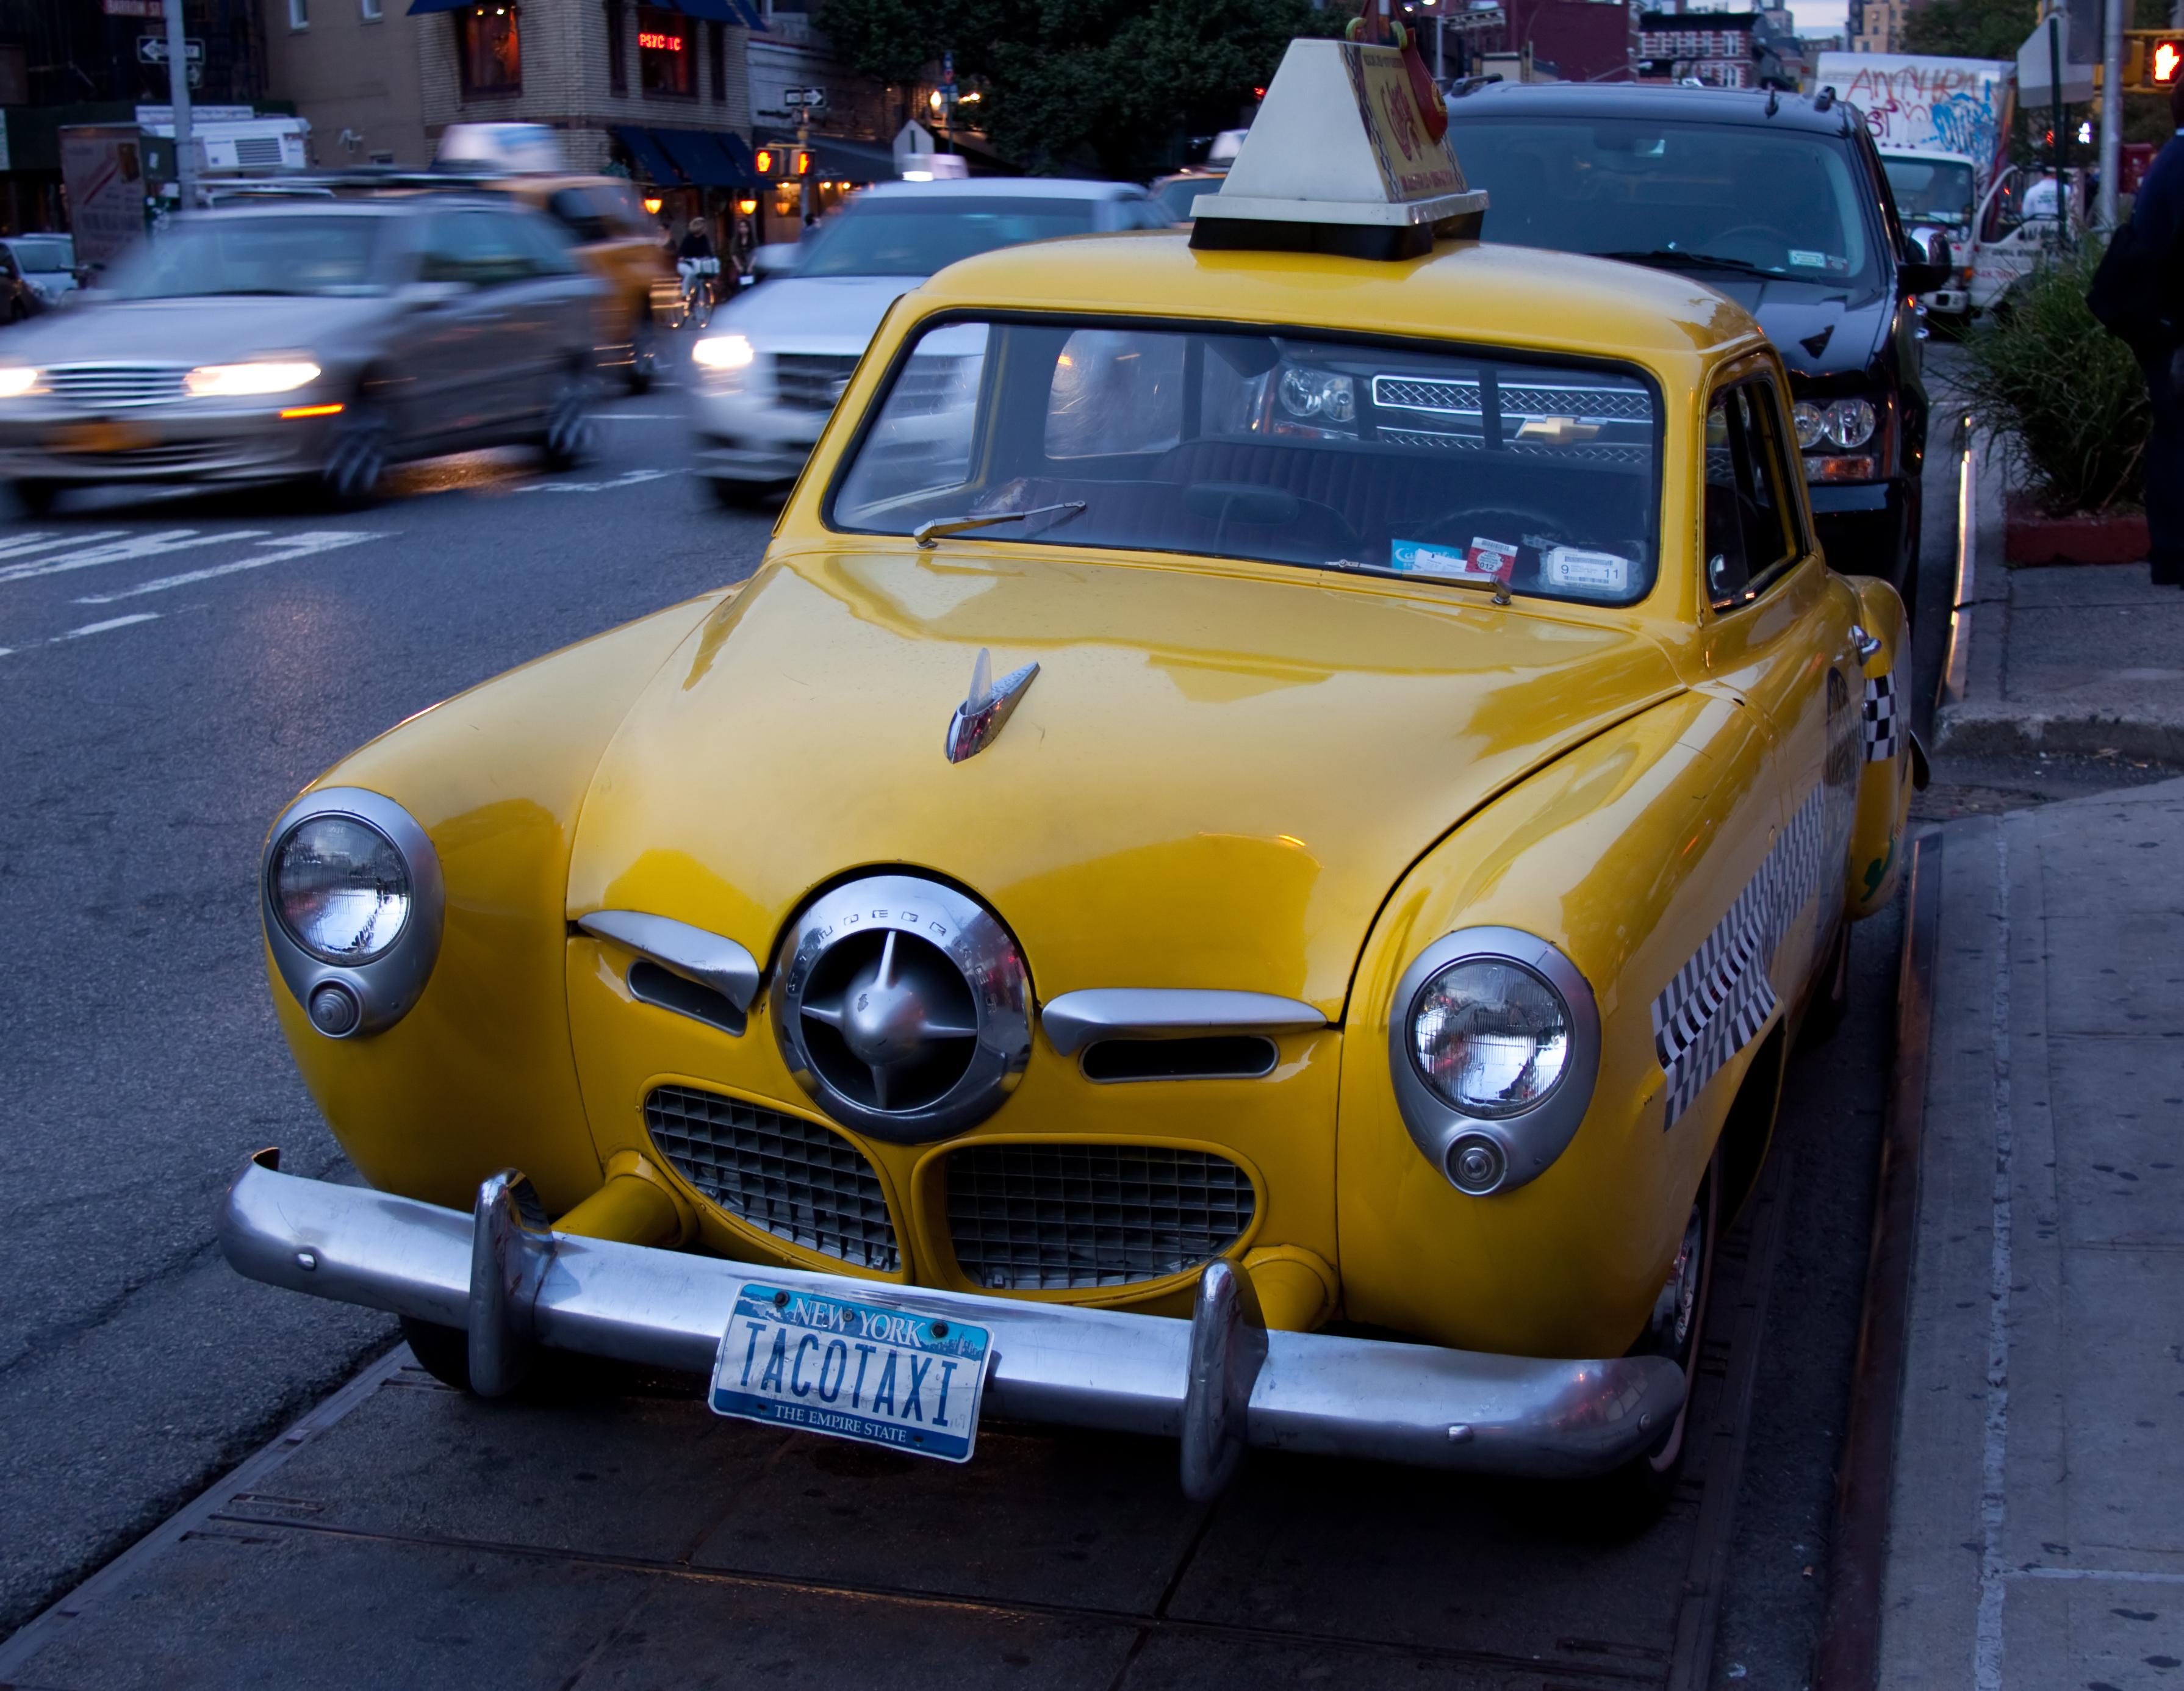 Using Taxi In Ireland Instead Of Hiring Car